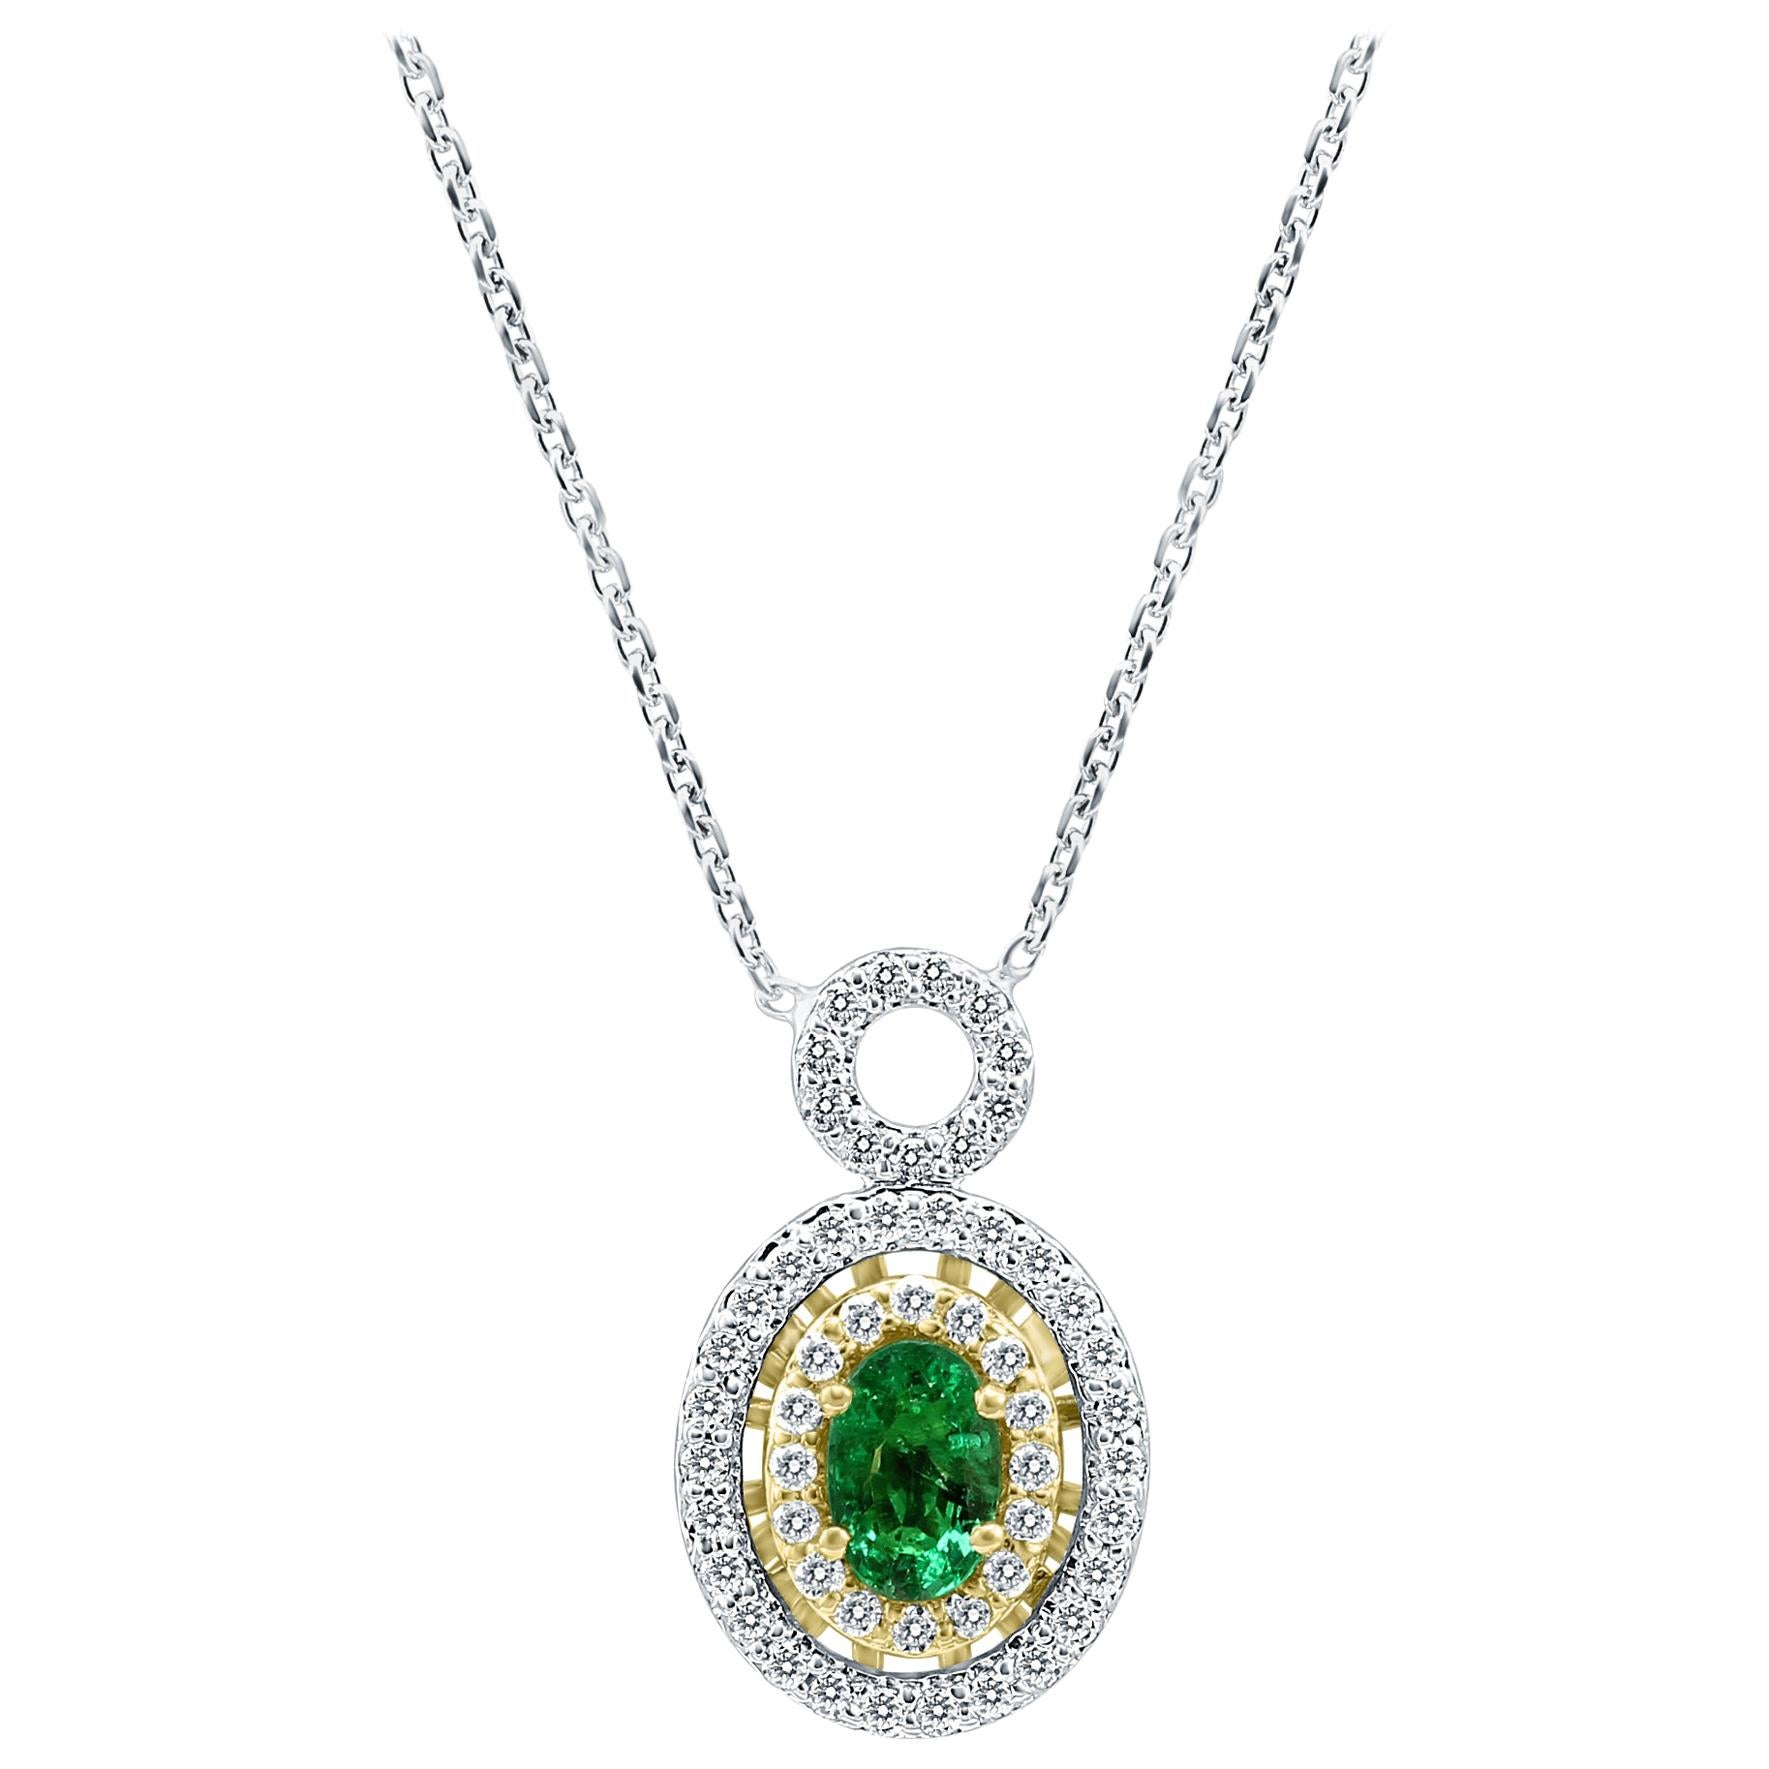 Emerald Oval White Diamond Double Halo Two Color Gold Pendant Chain Necklace